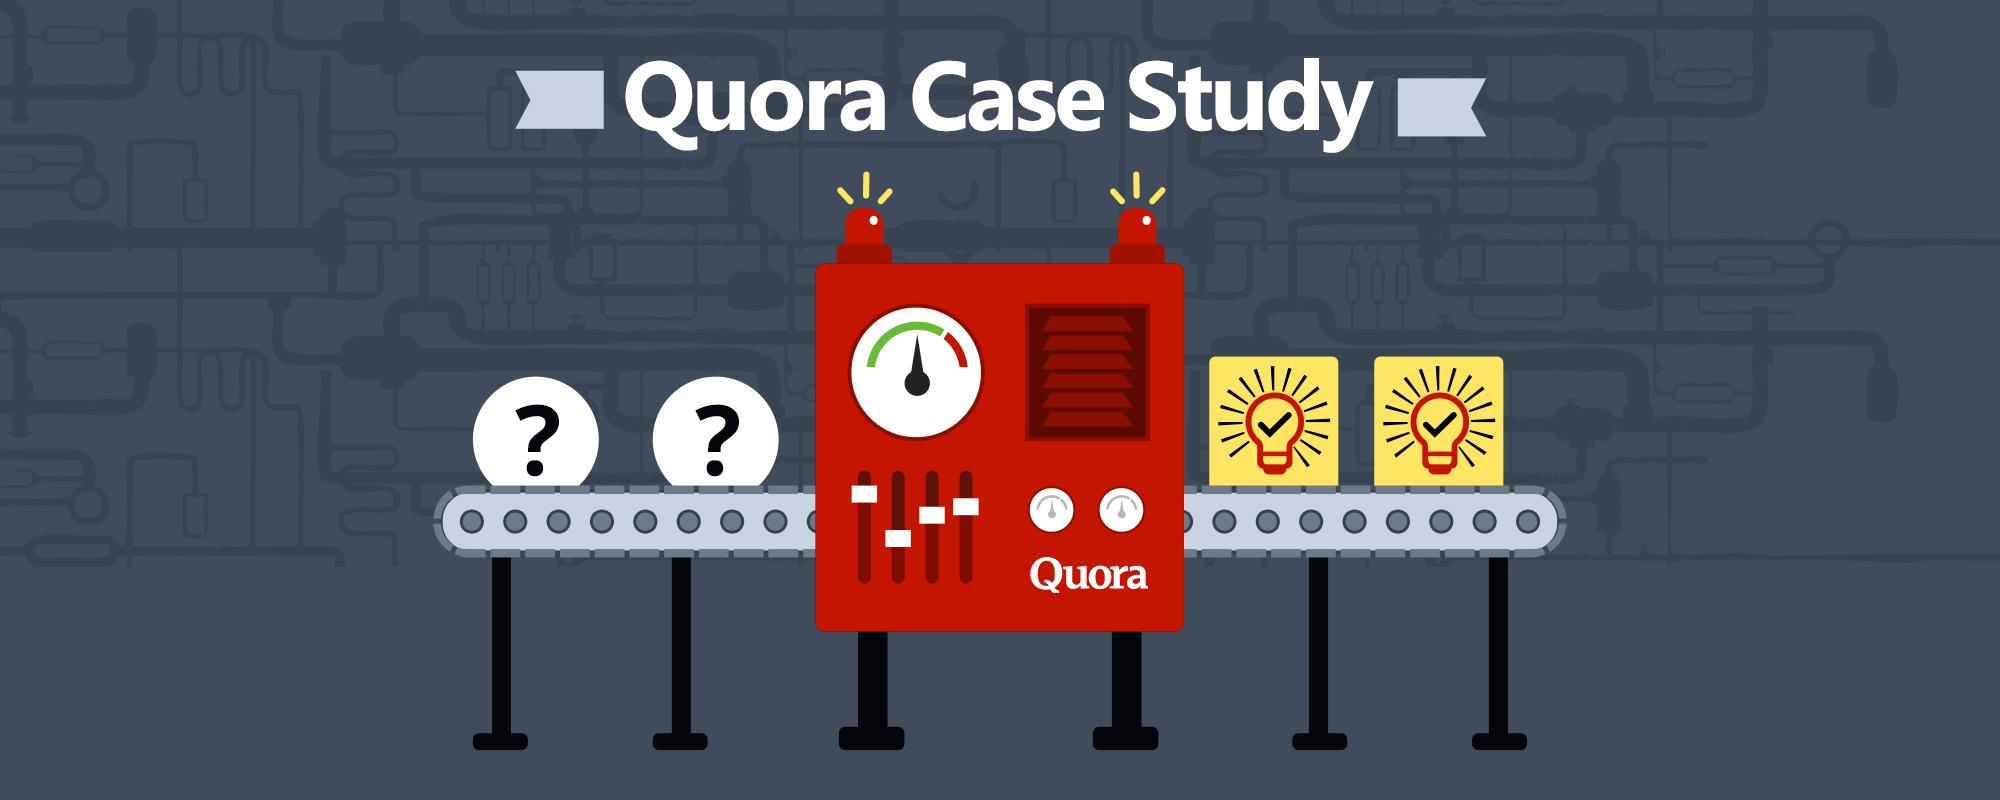 Quora Case Study – The Wonderful World of Quora